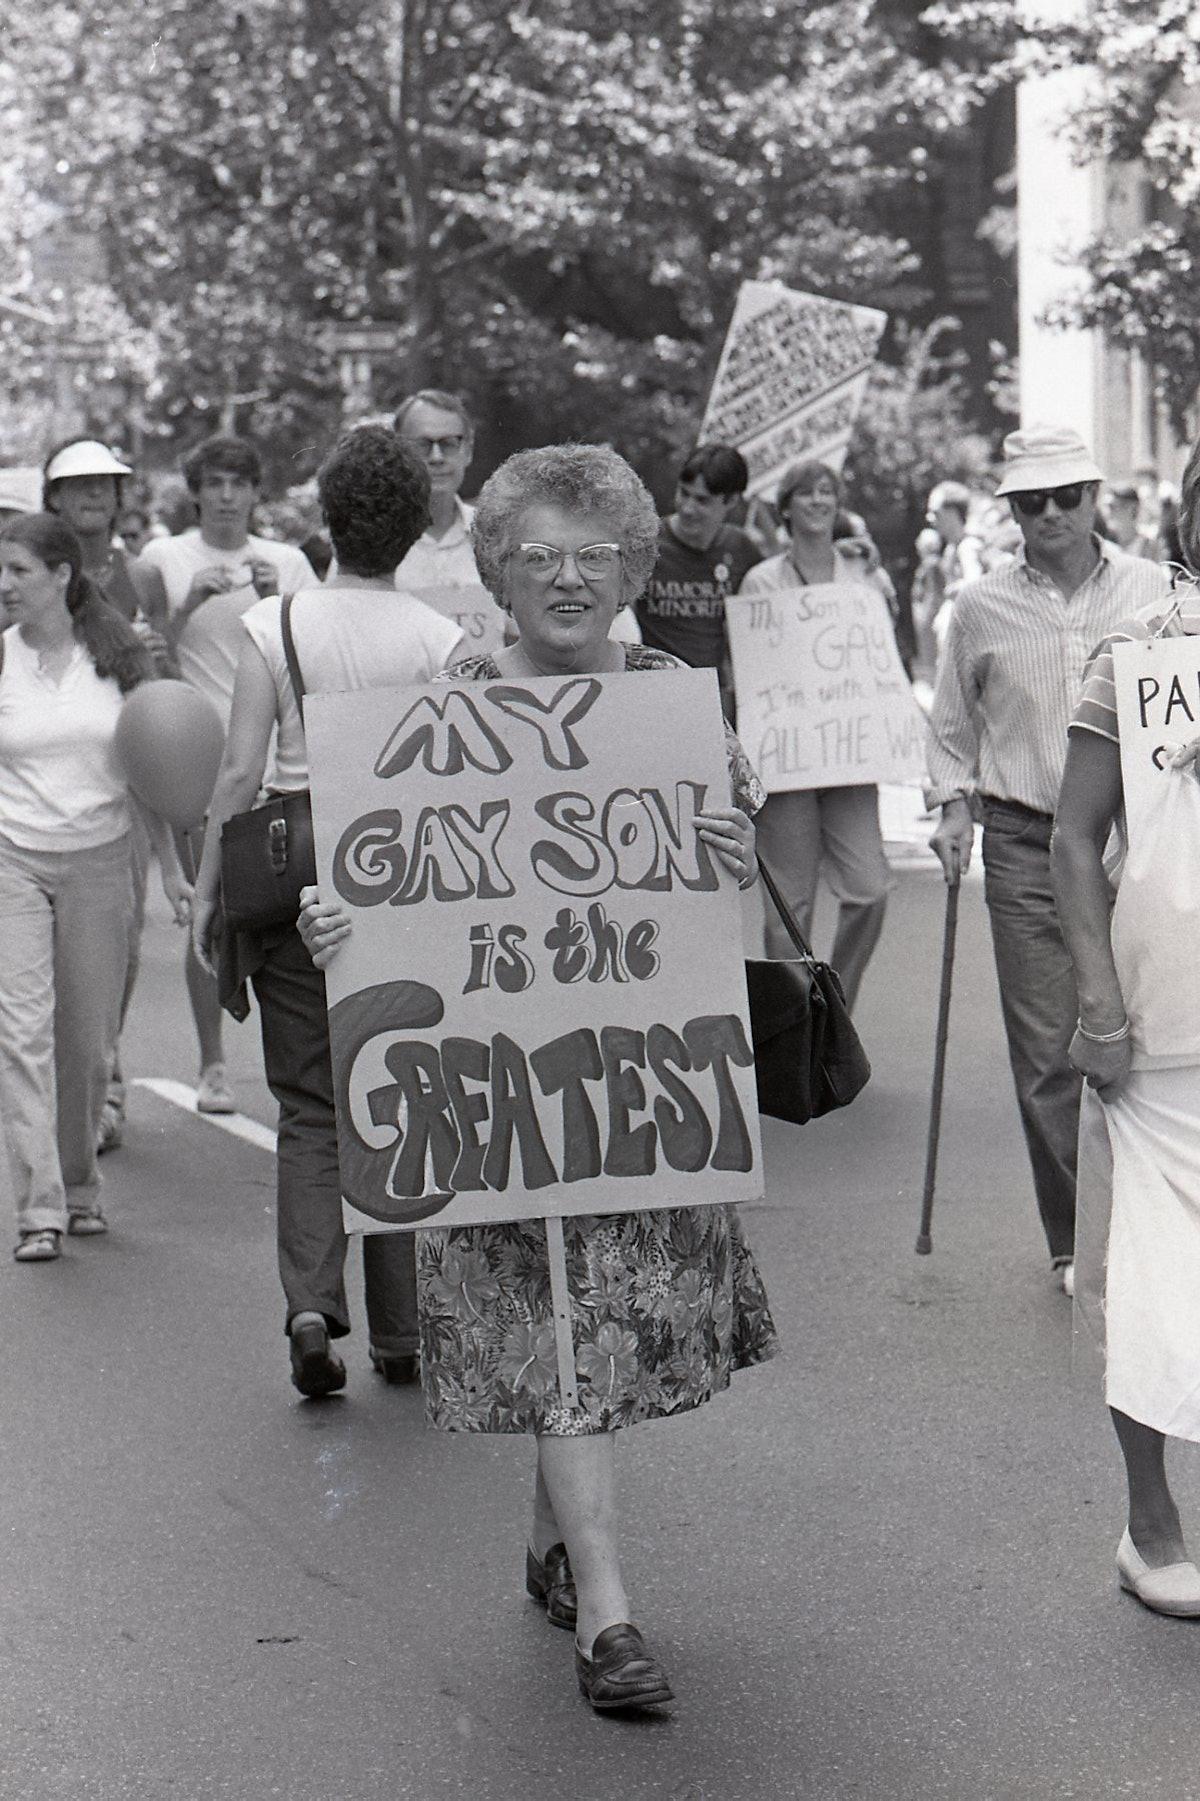 New York City Gay Pride Parade, 1981